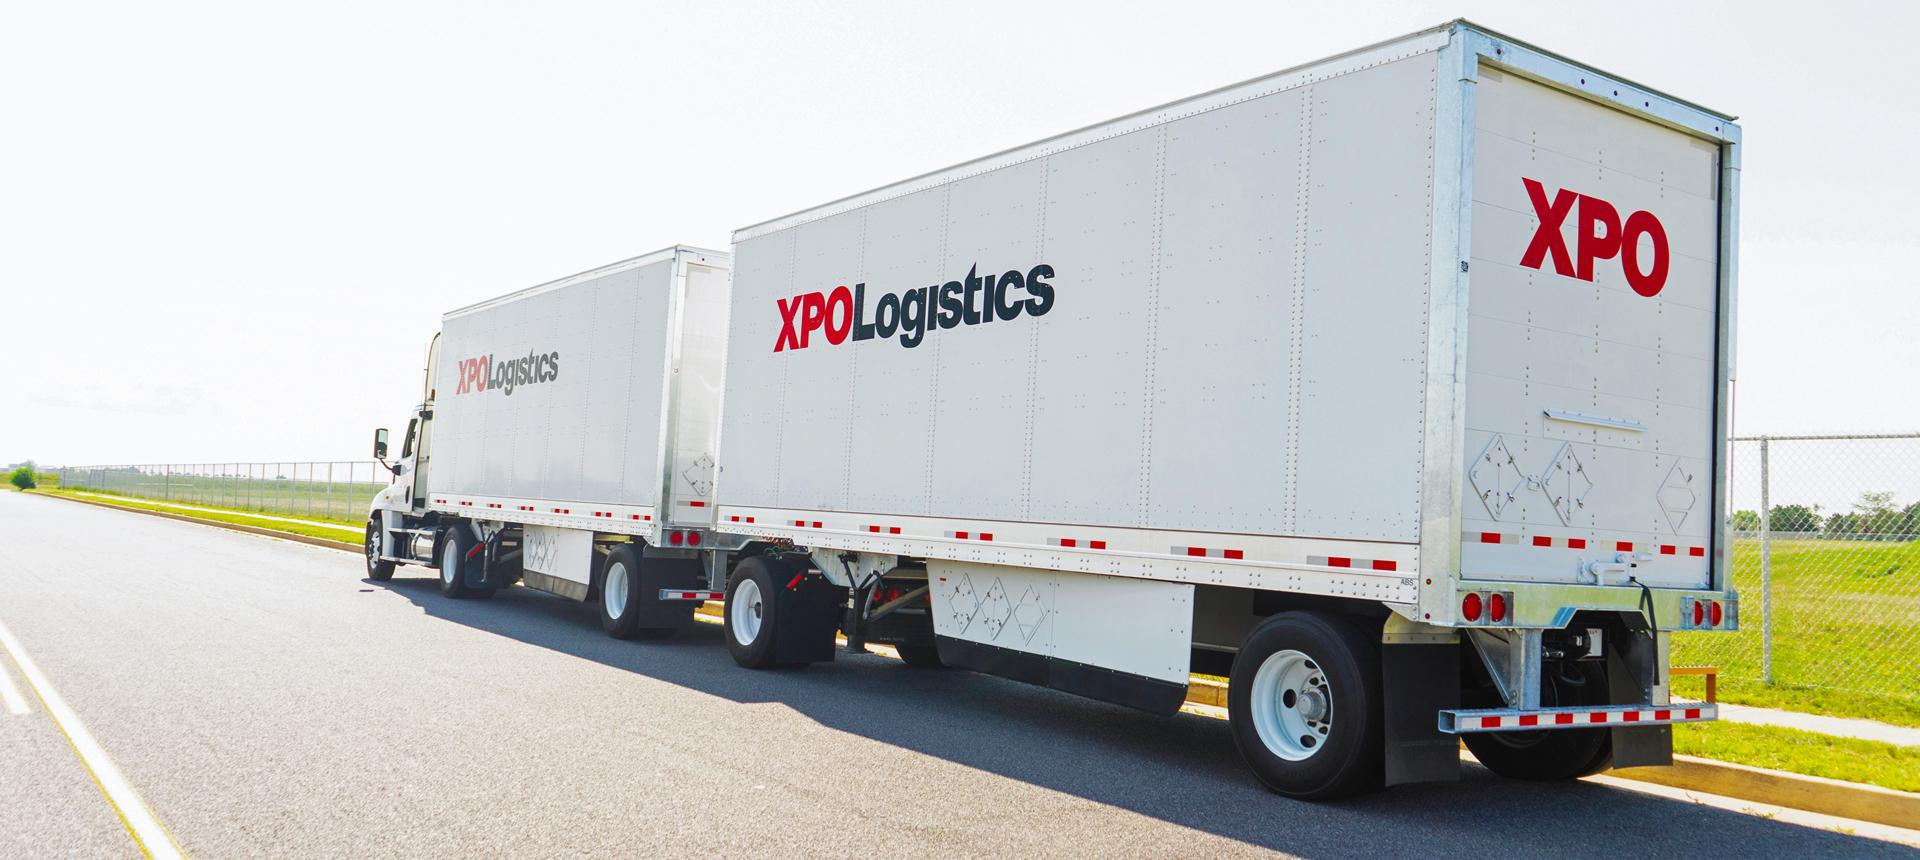 XPO LTL double-truck on road